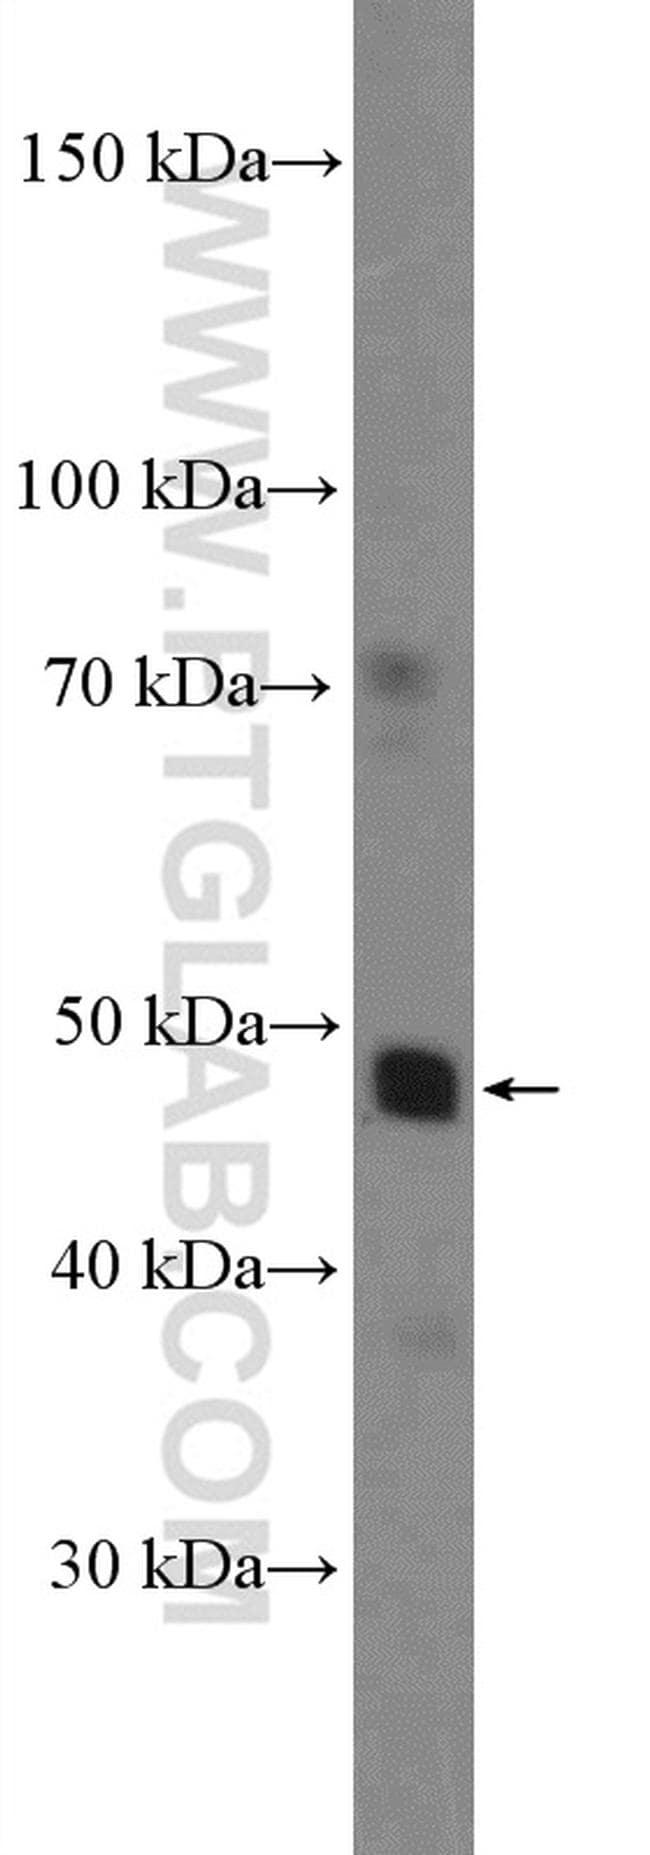 NR1H4 Antibody in Western Blot (WB)